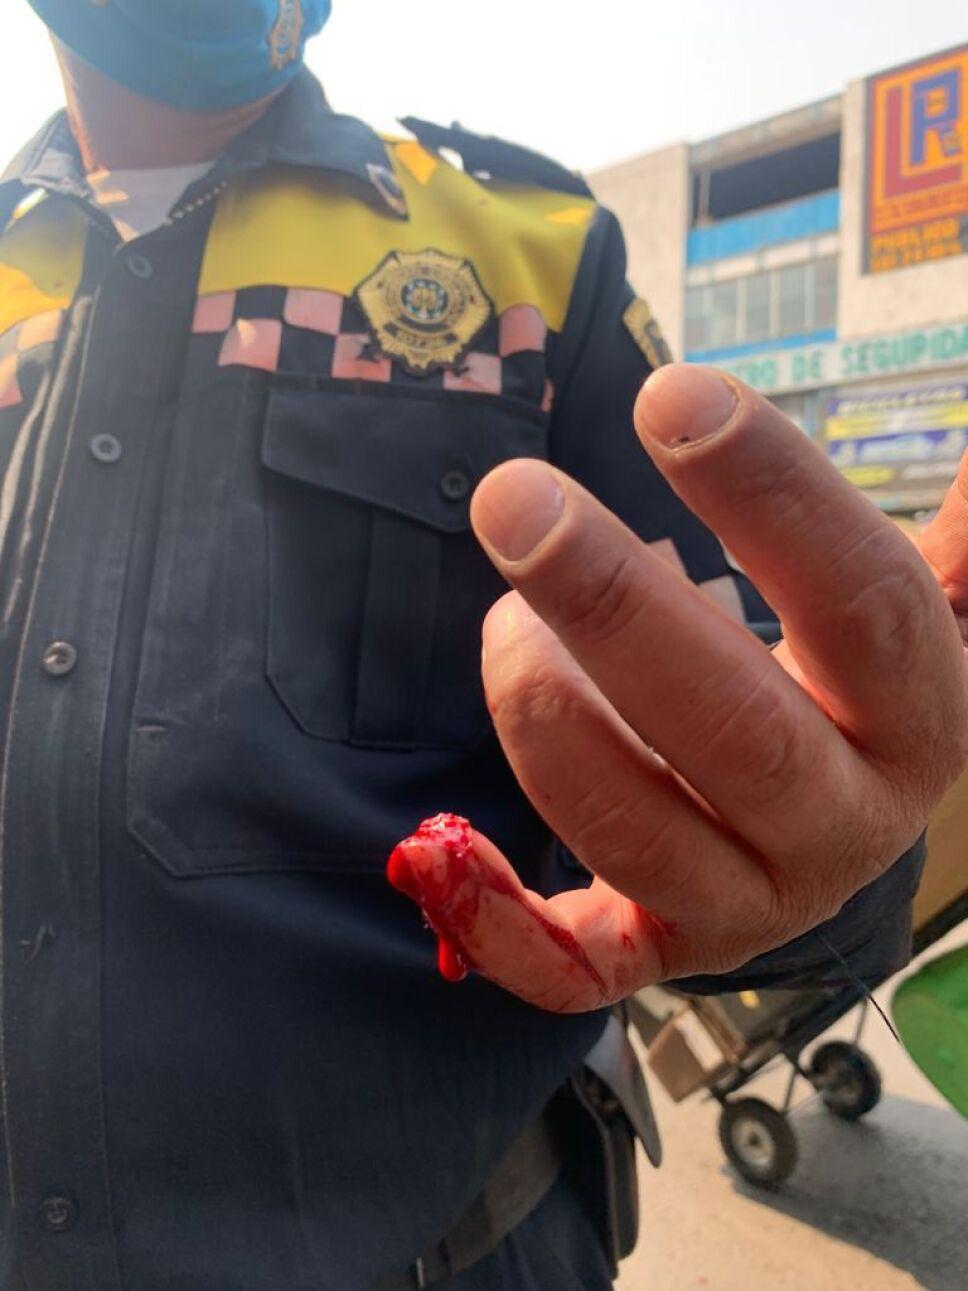 Policía agredido